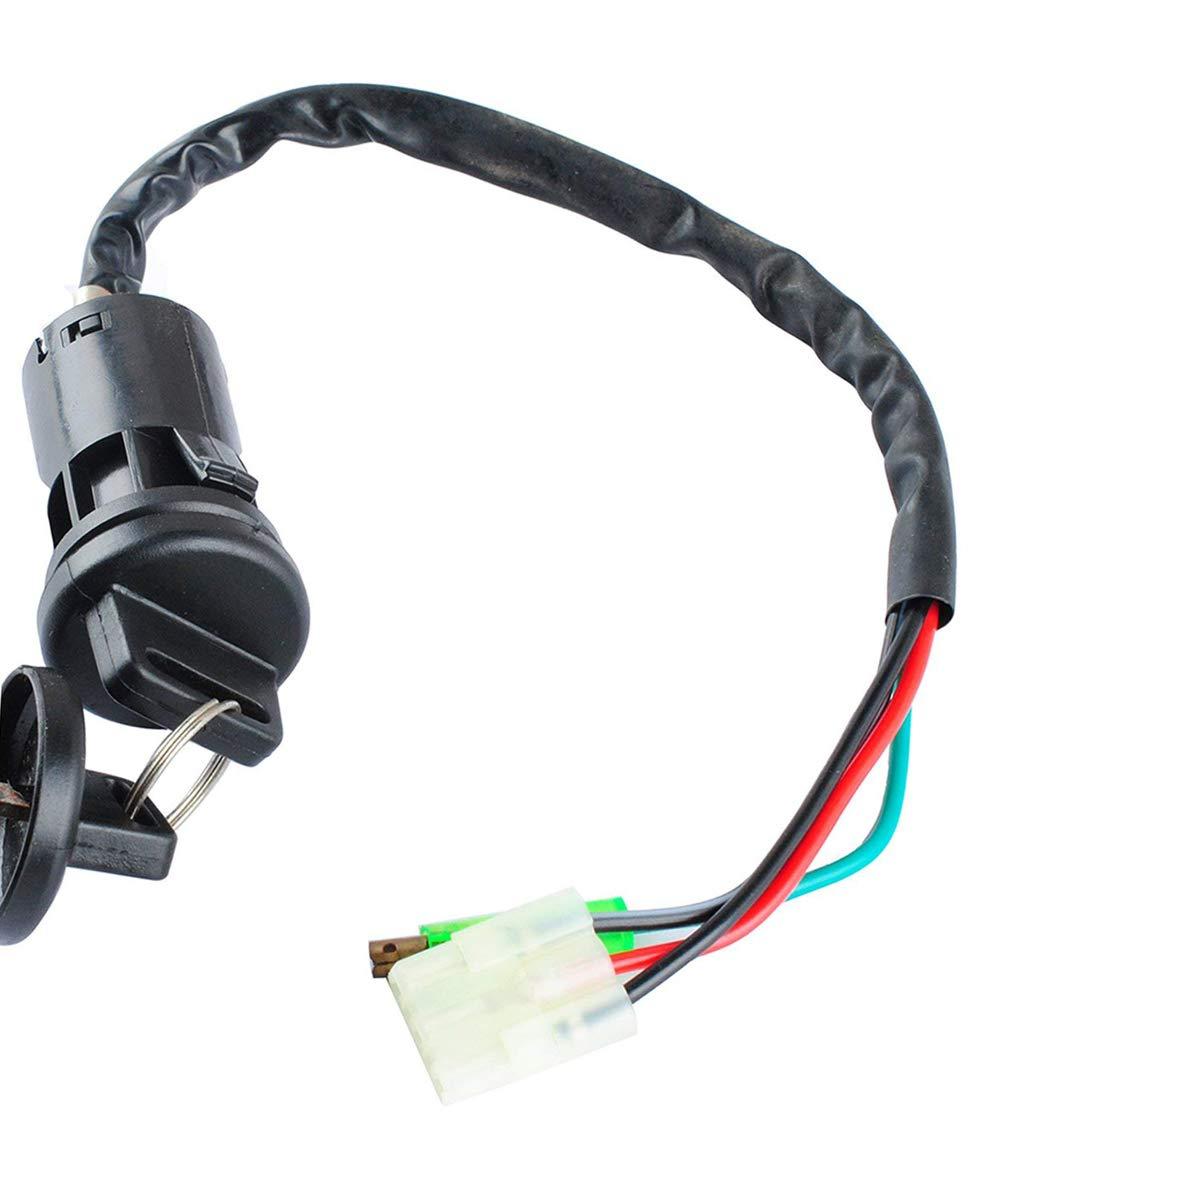 Ignition Key Switch with Spark Plug for HONDA TRX400EX TRX 400EX 1999 2000 2001 2002 2003 2004